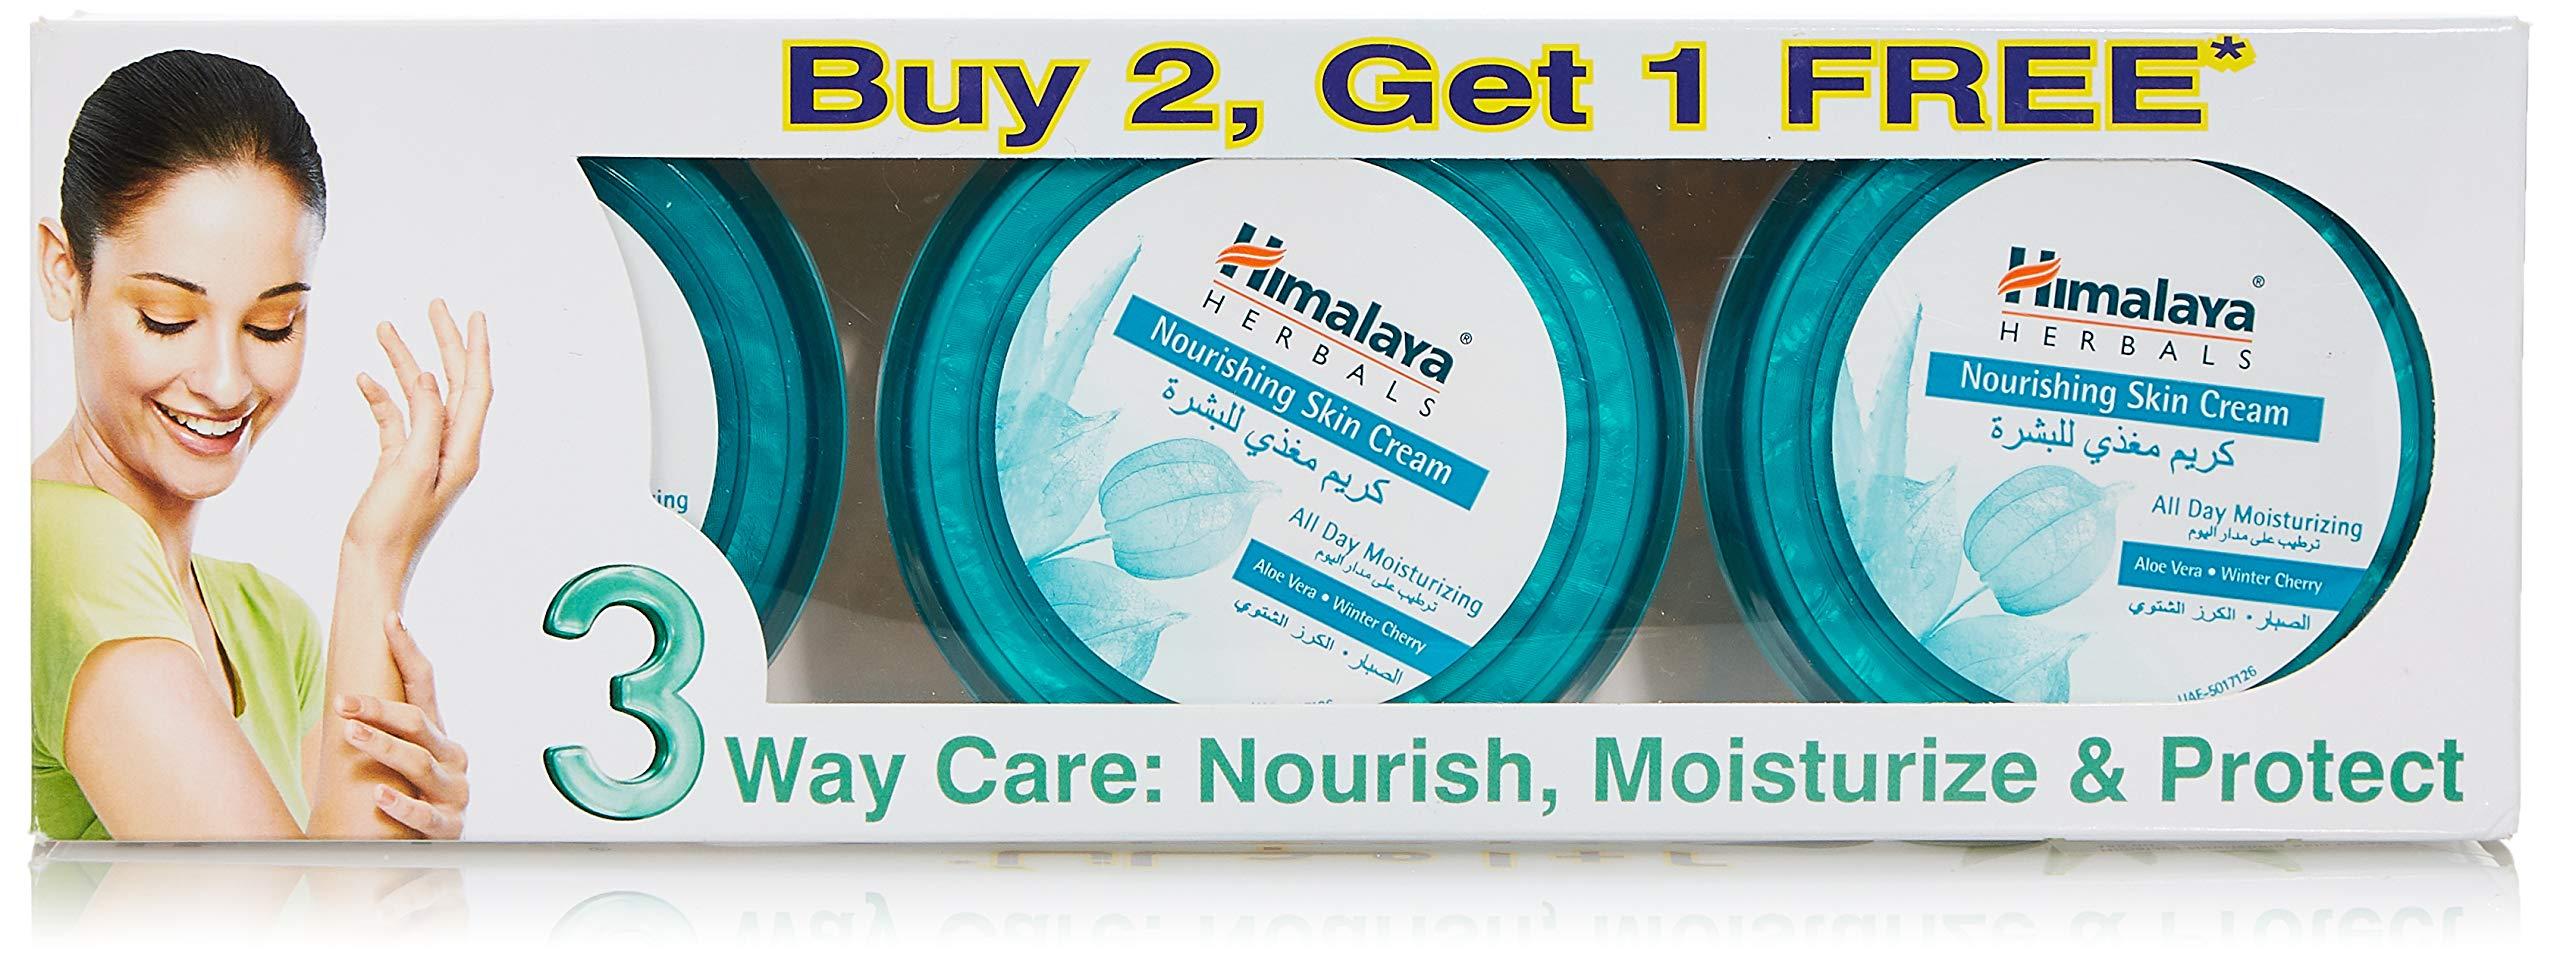 Himalaya Nourishing Skin Cream, 3 X 150 ml